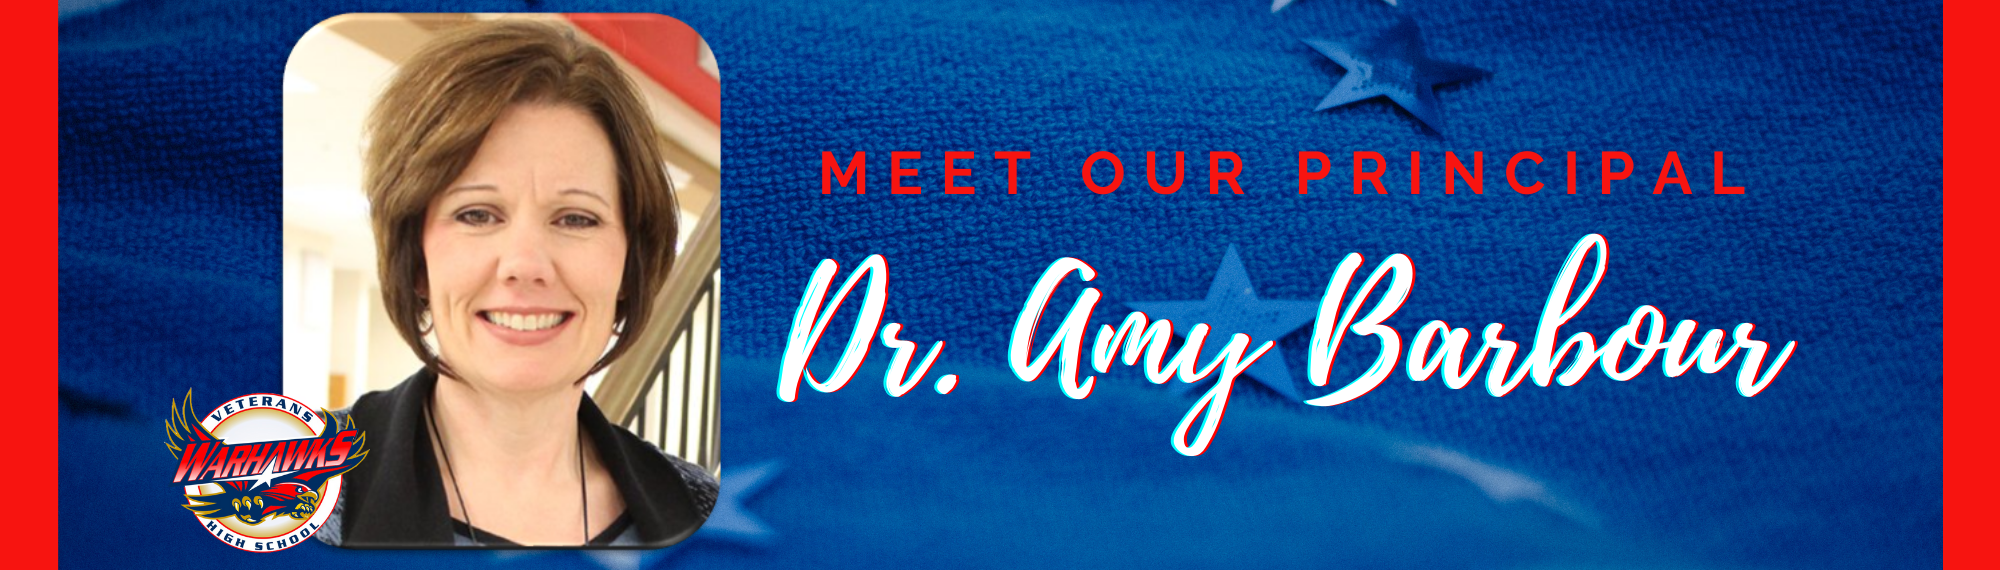 Meet our Principal Dr. Amy Barbour